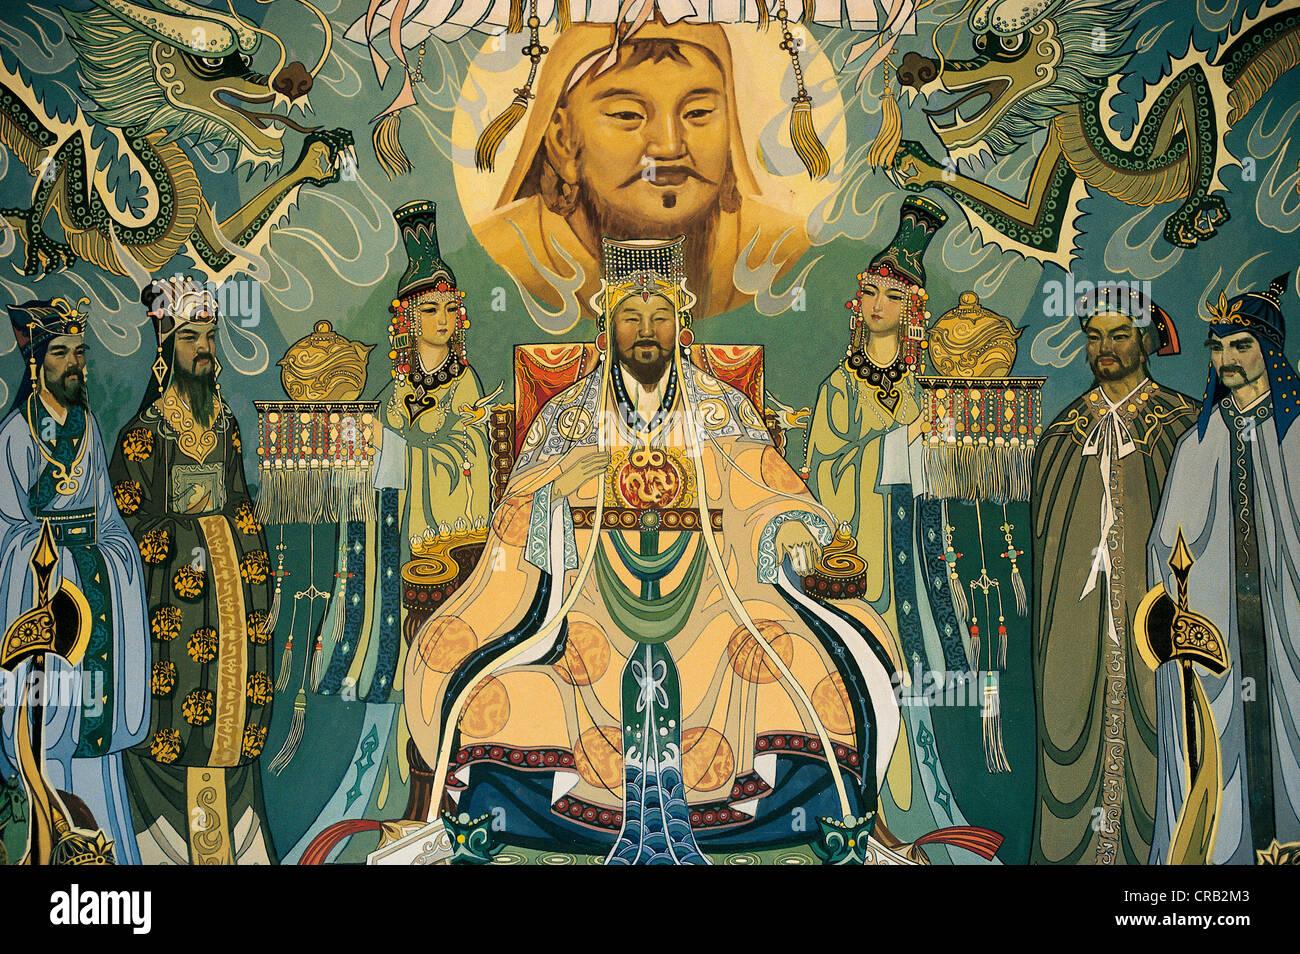 mural with genghis khan temujin great khan of the mongol